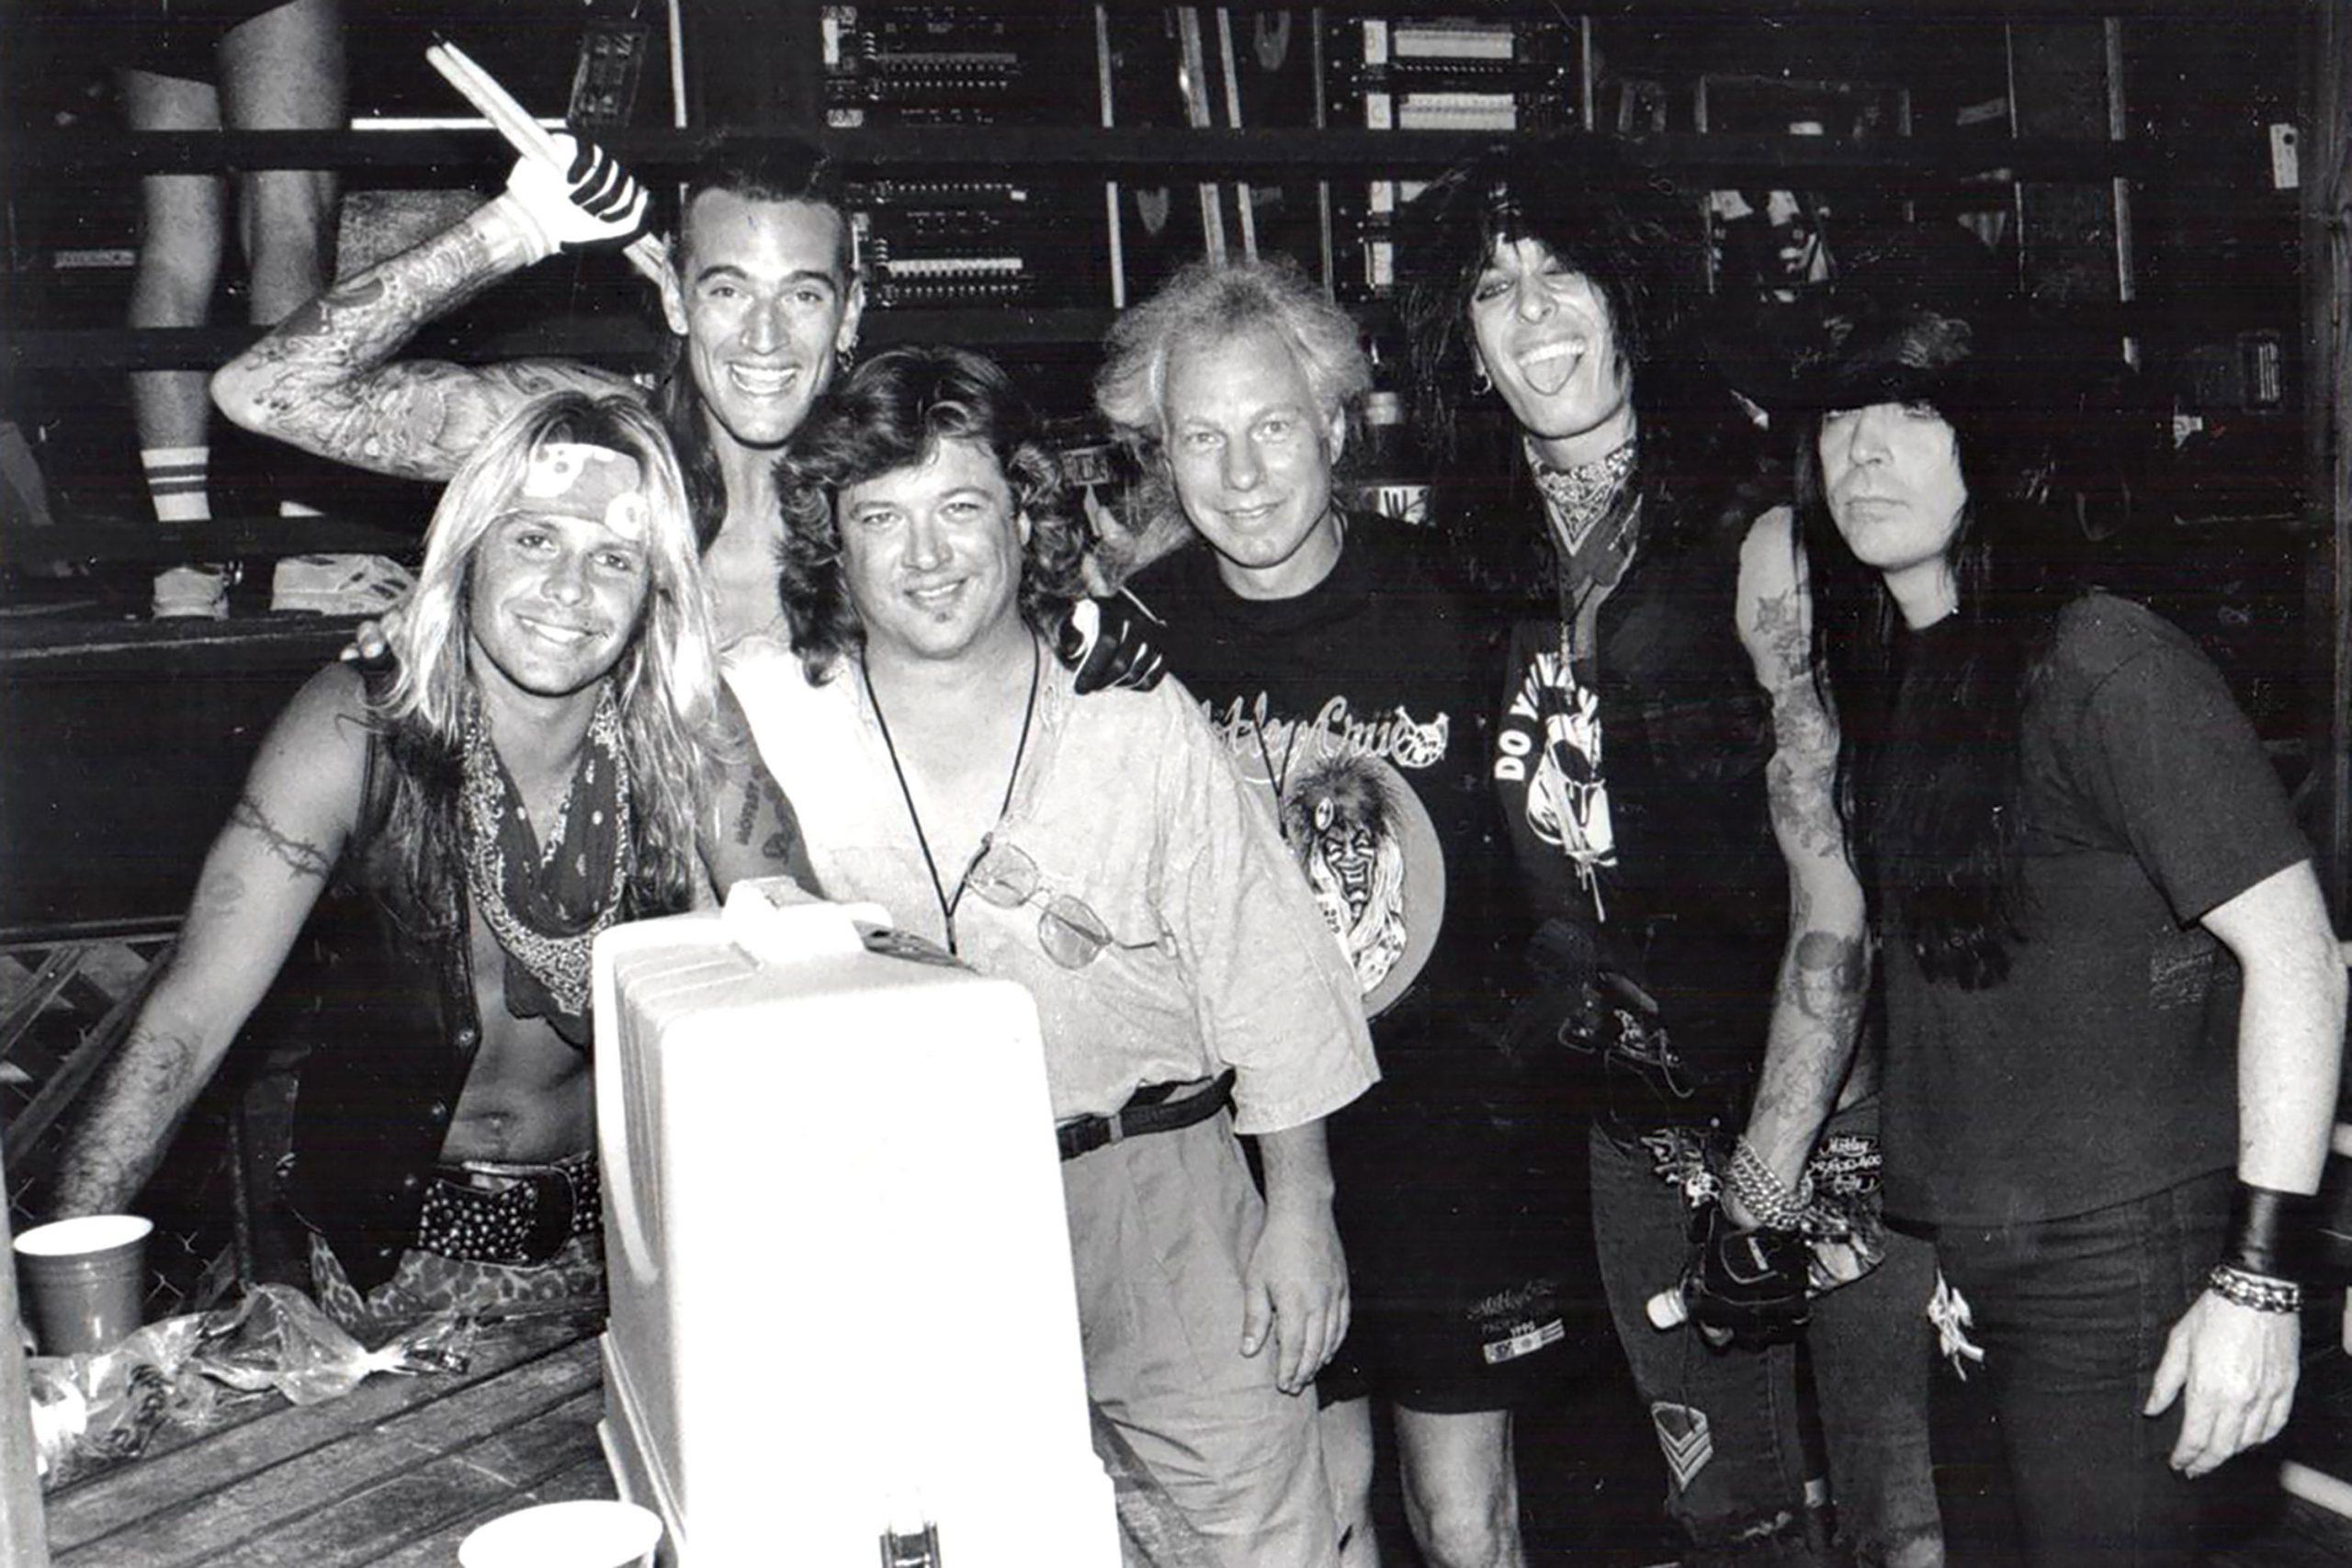 Danny Zelisko (third from left) with Mötley Crüe in the late '80s; Photo courtesy Danny Zelisko